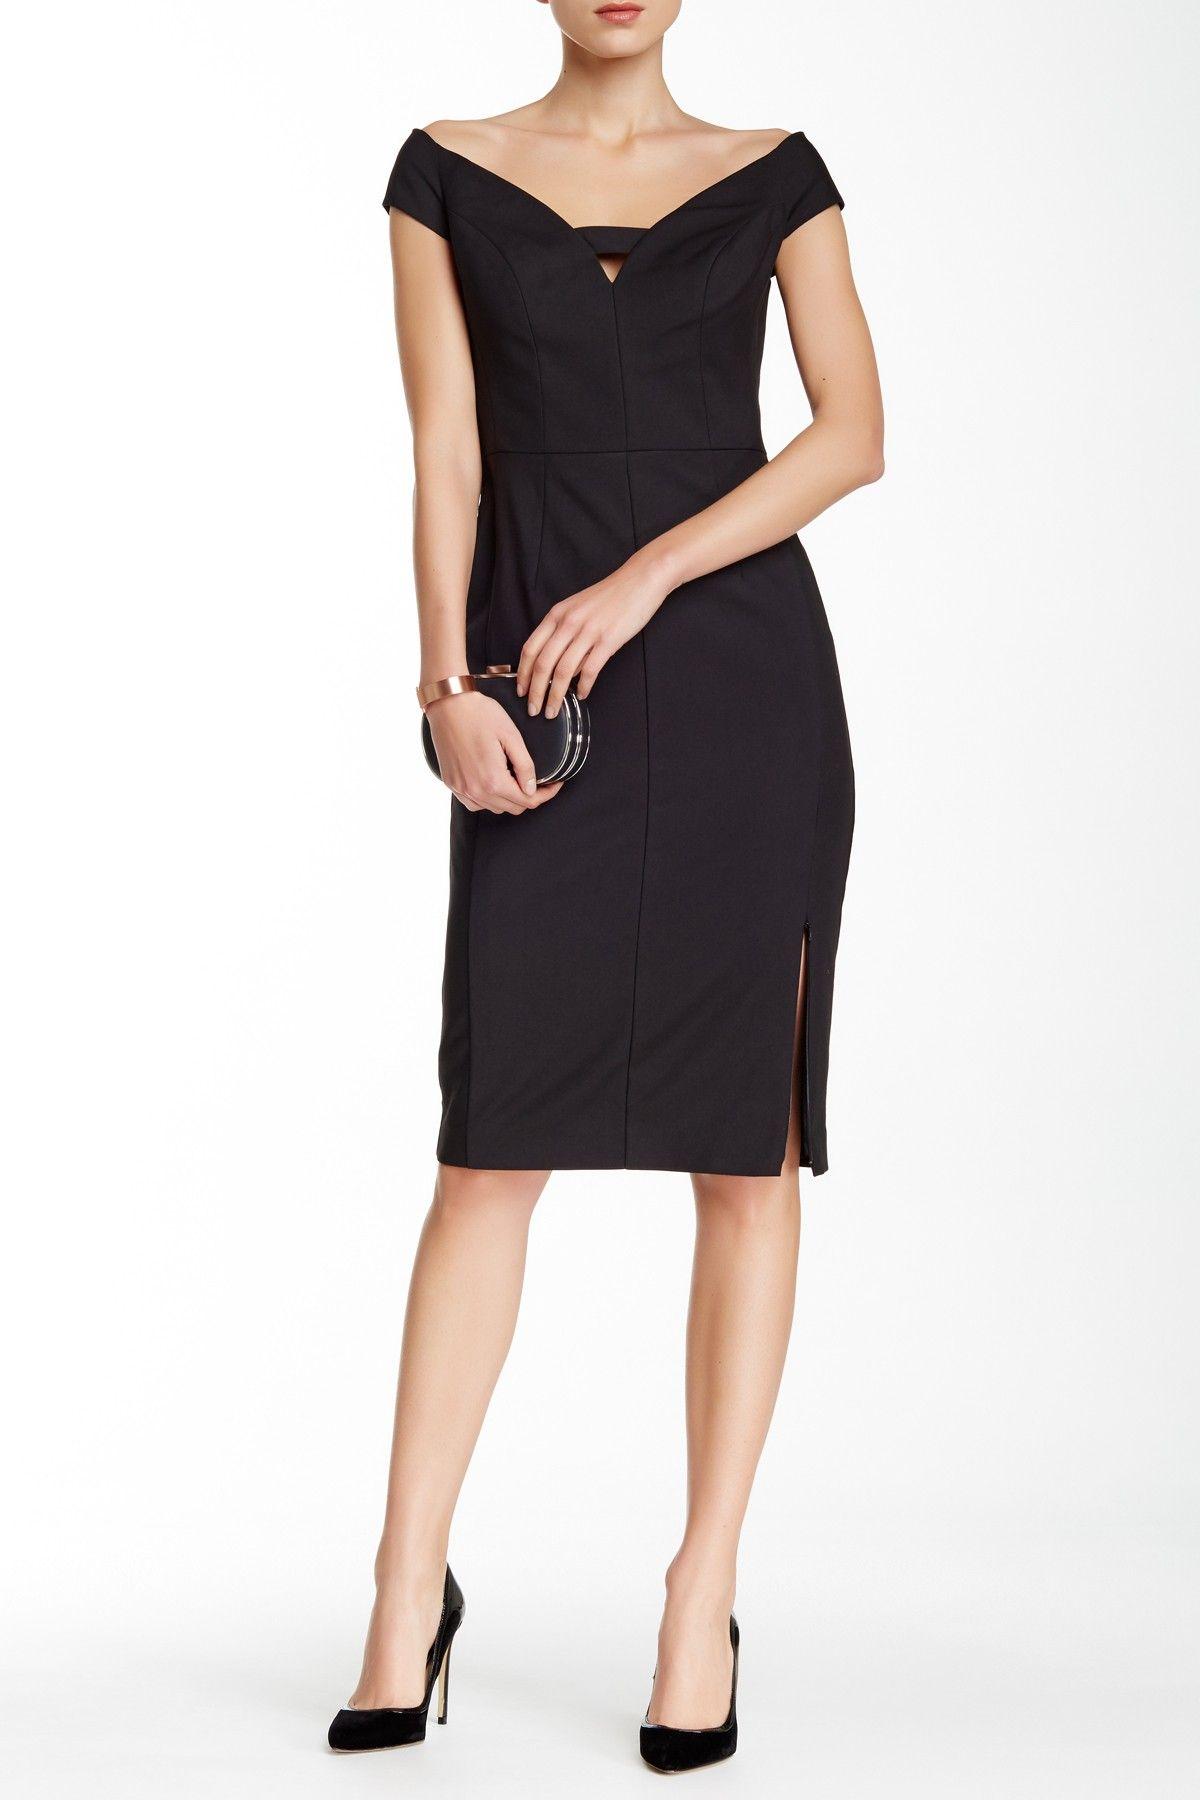 Black halo riya sheath dress women fashion pinterest free